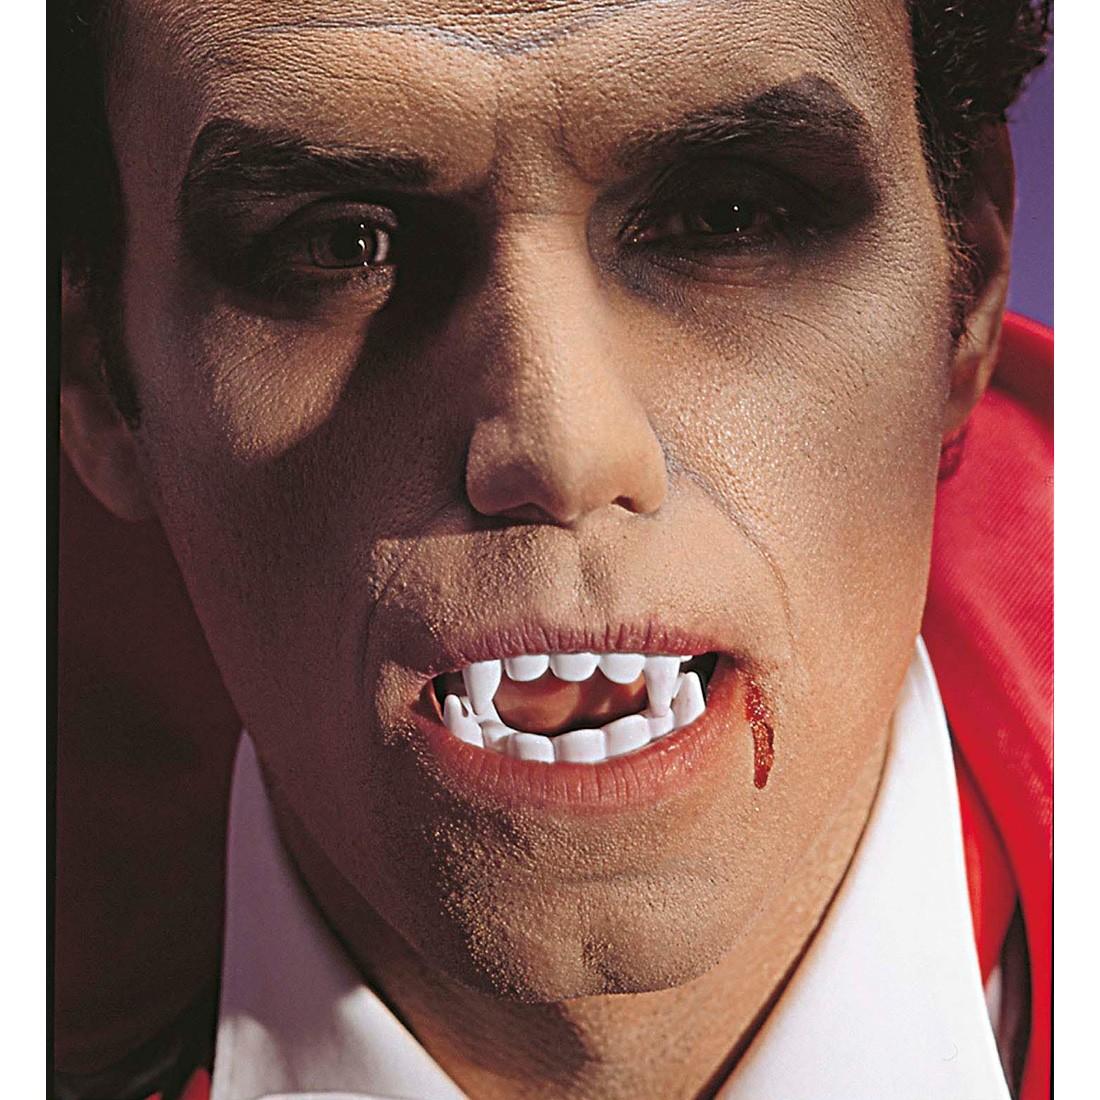 vampir zähne mensch